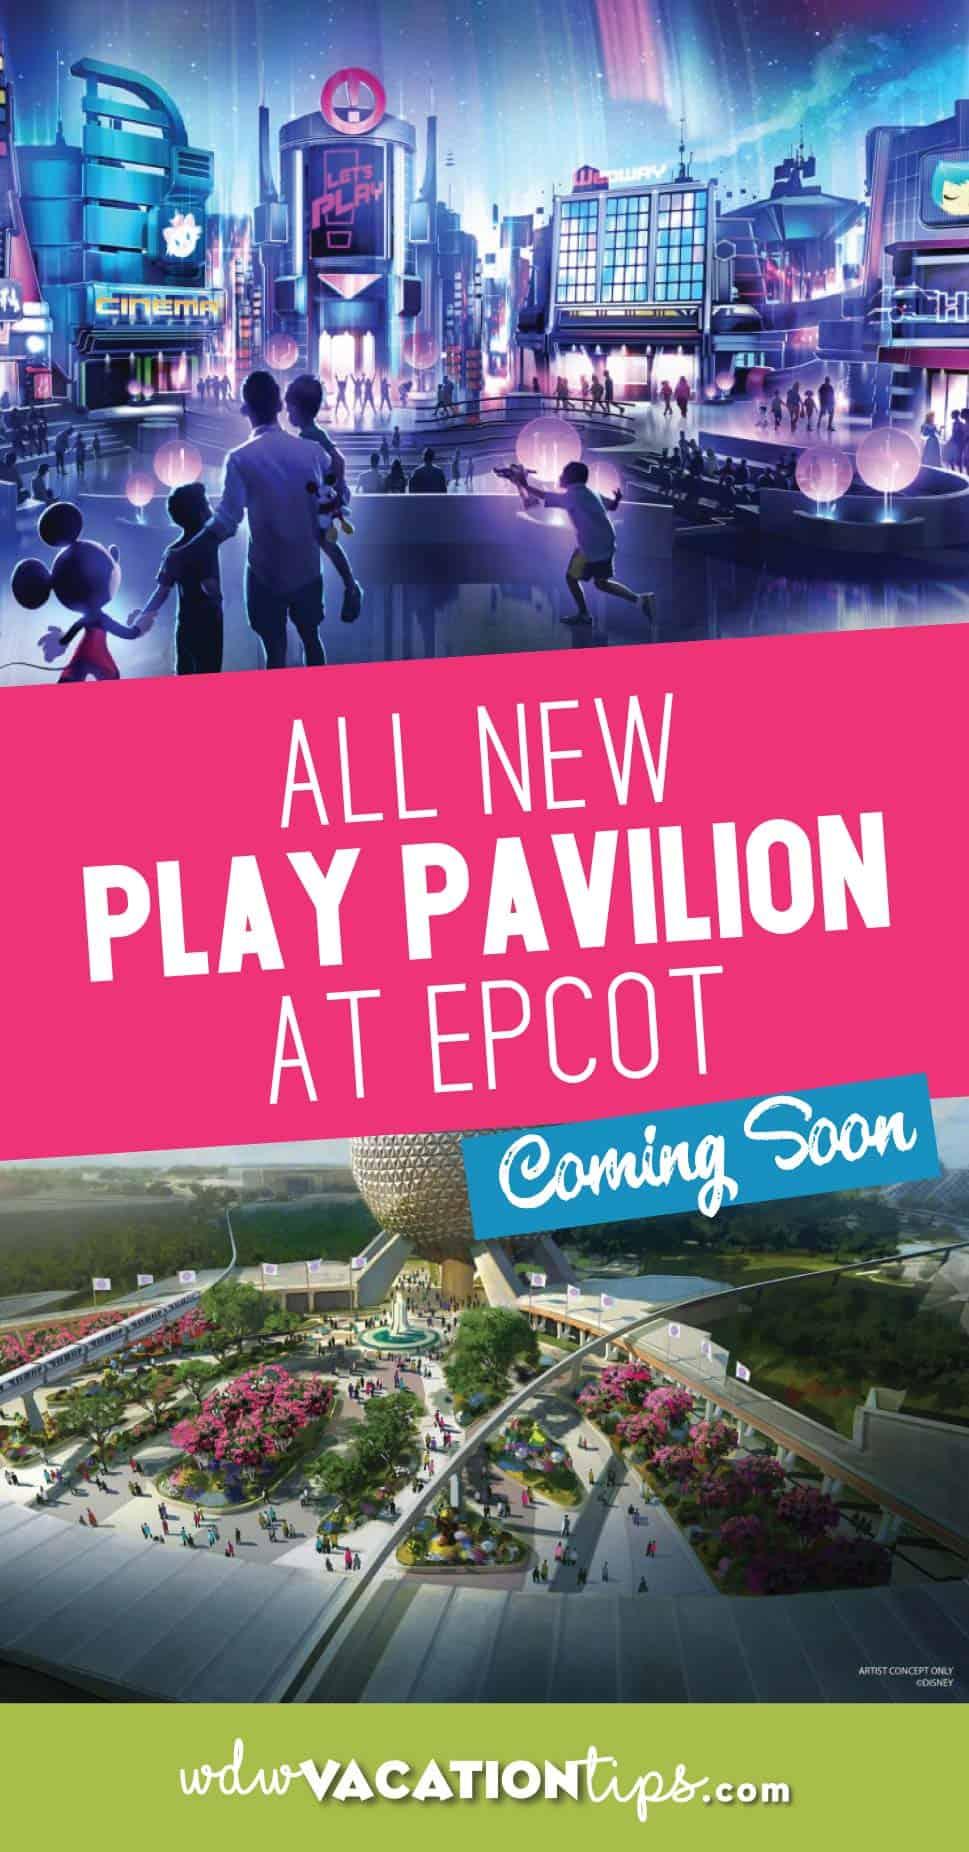 New Epcot Play Pavilion